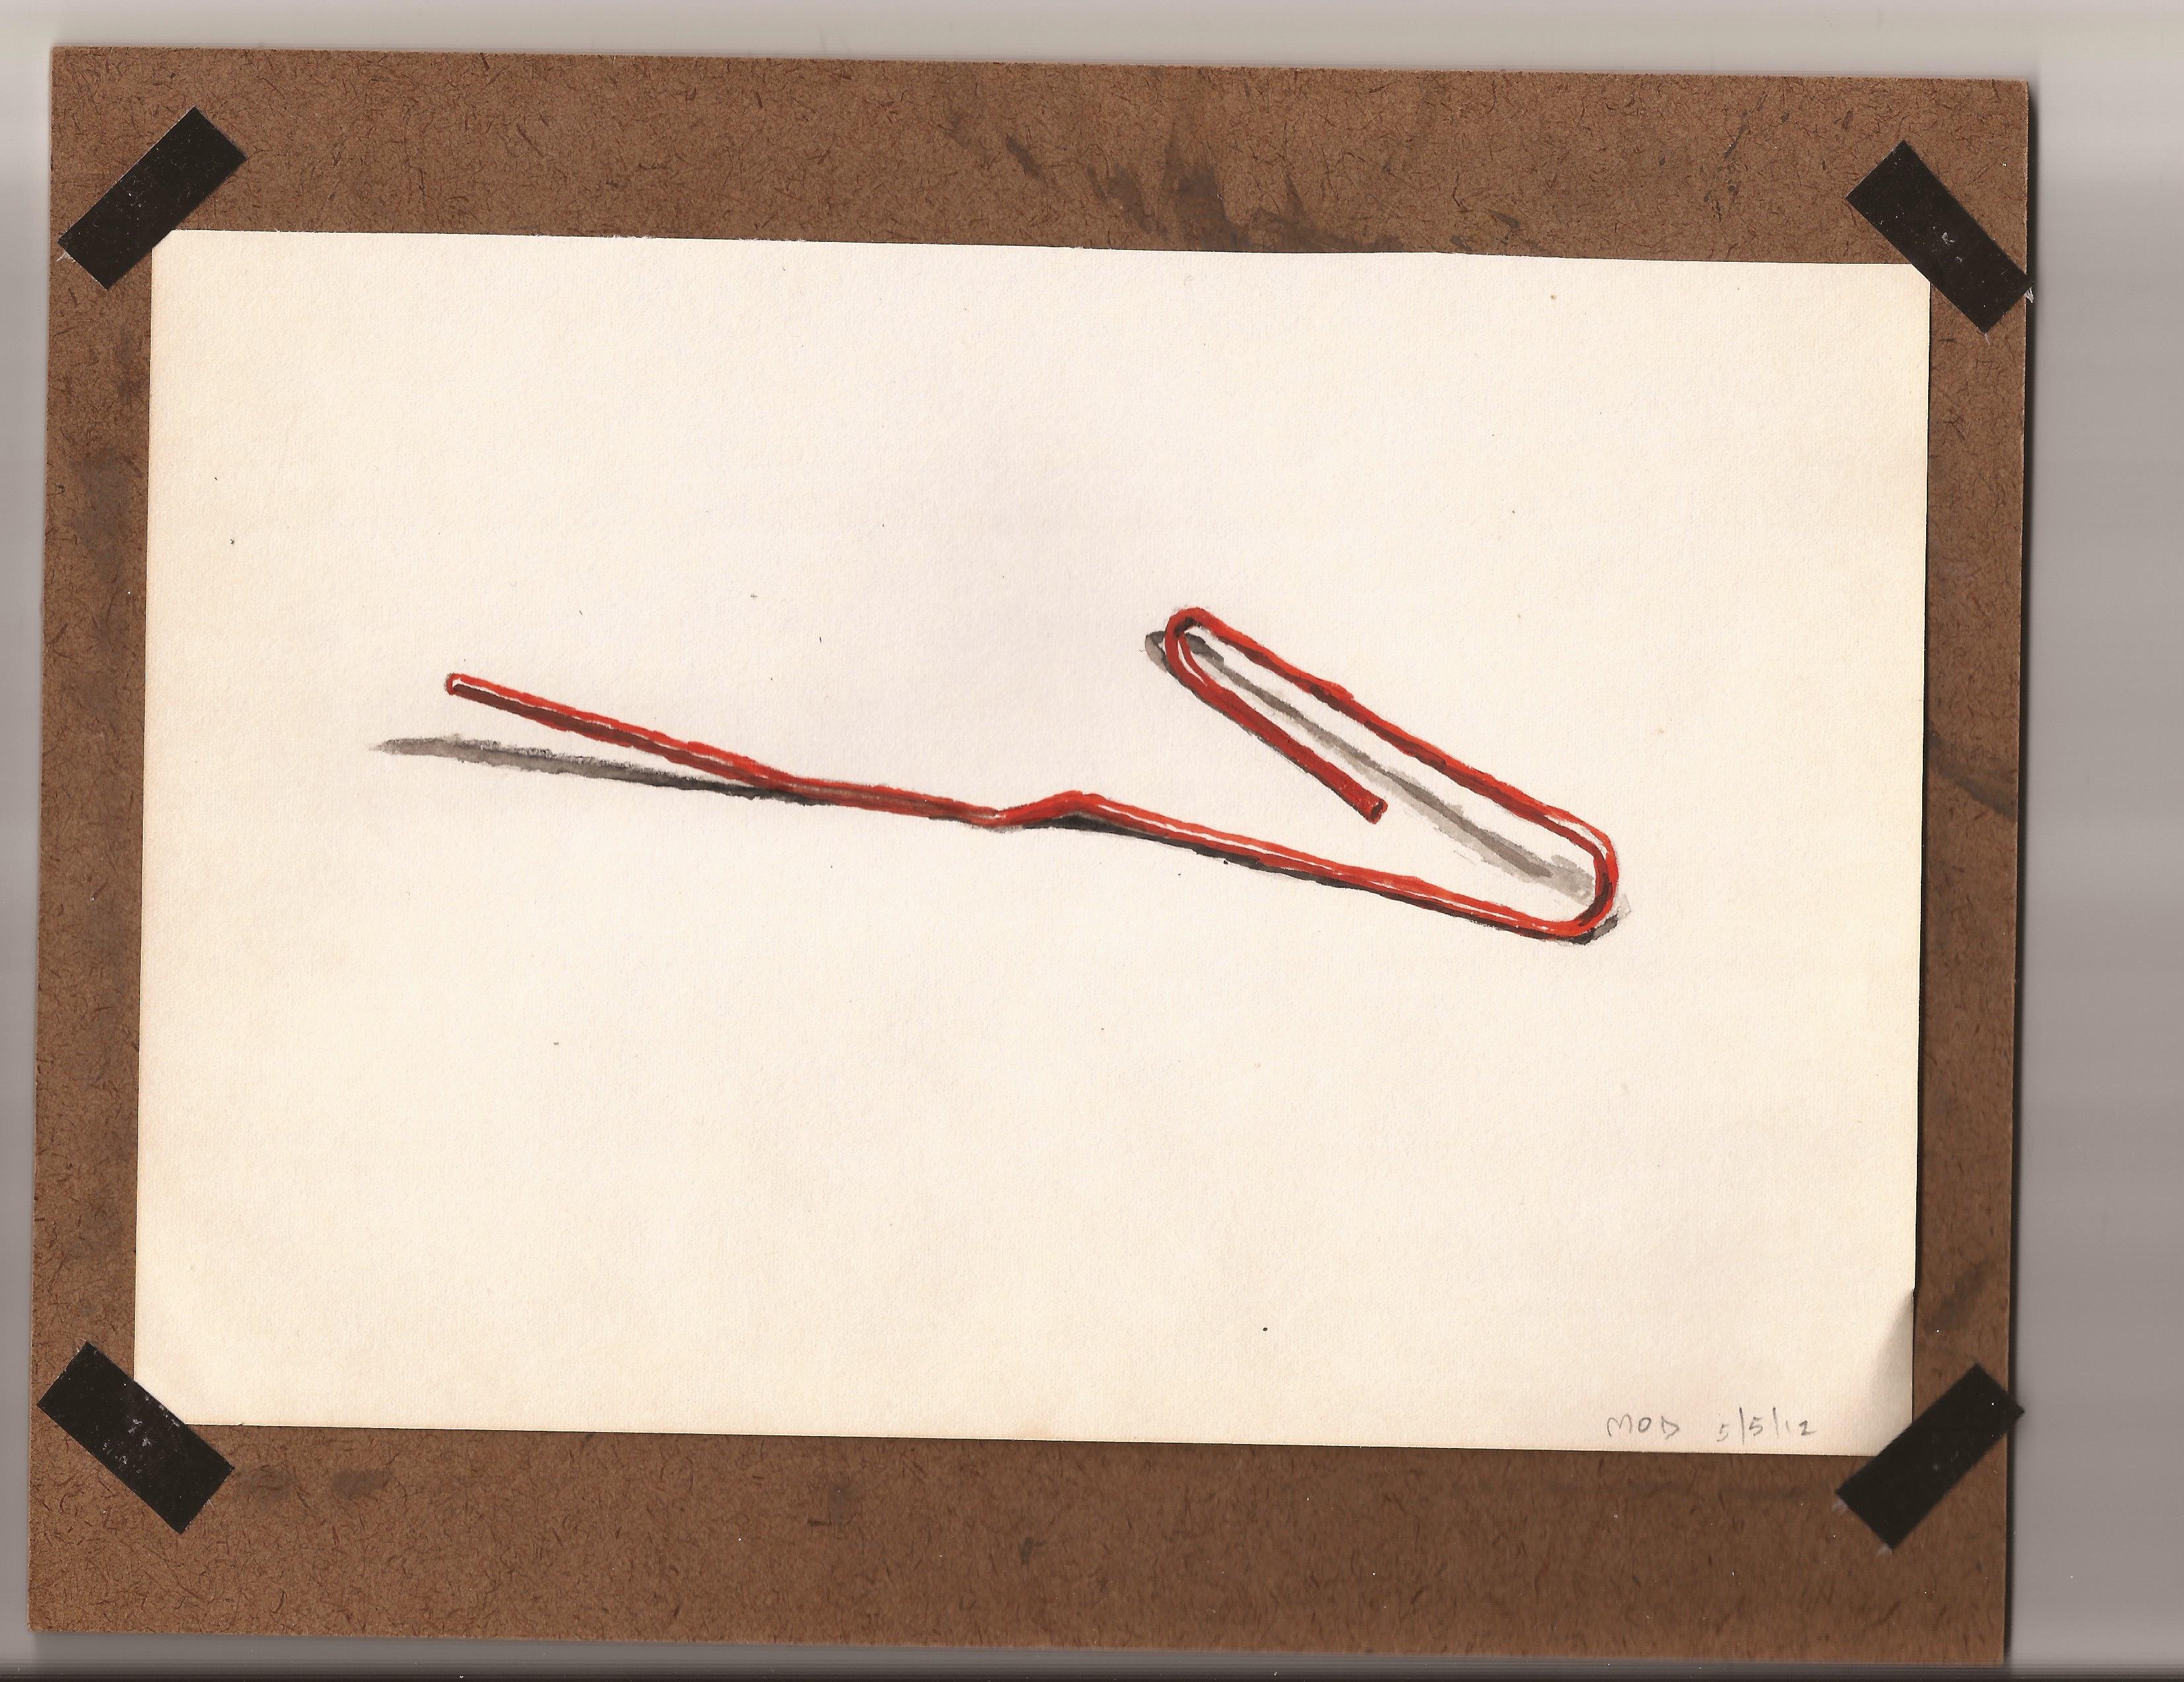 Paper Clip, 2012